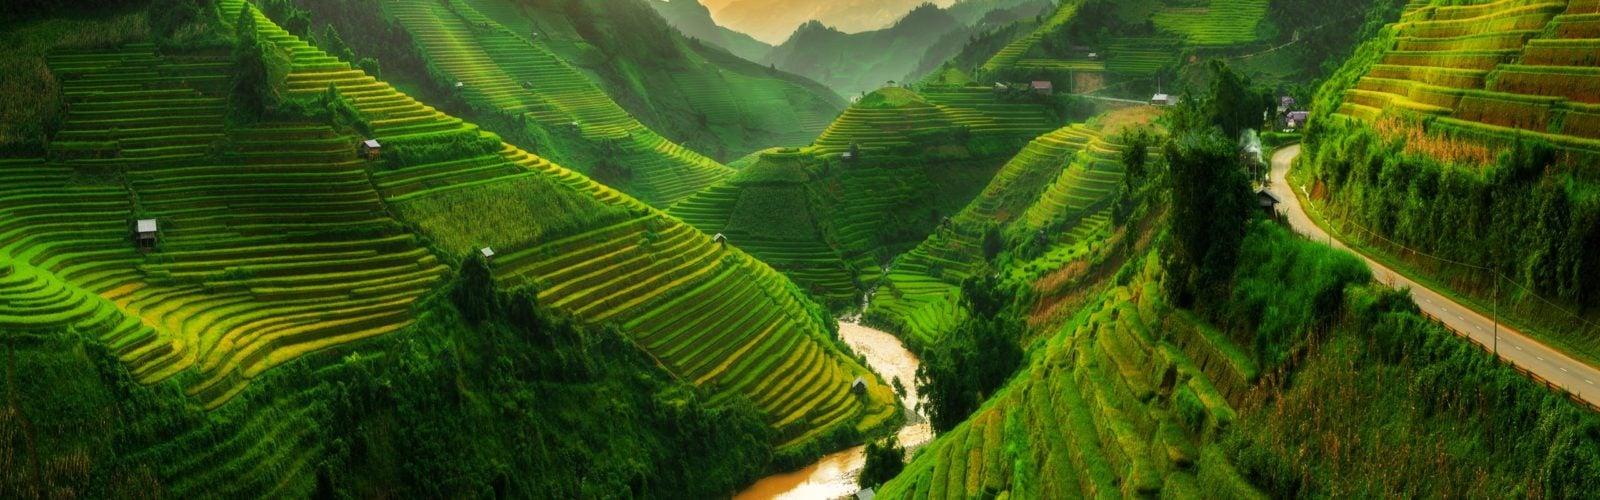 rice-field-mu-cang-chai-sapa-vietnam